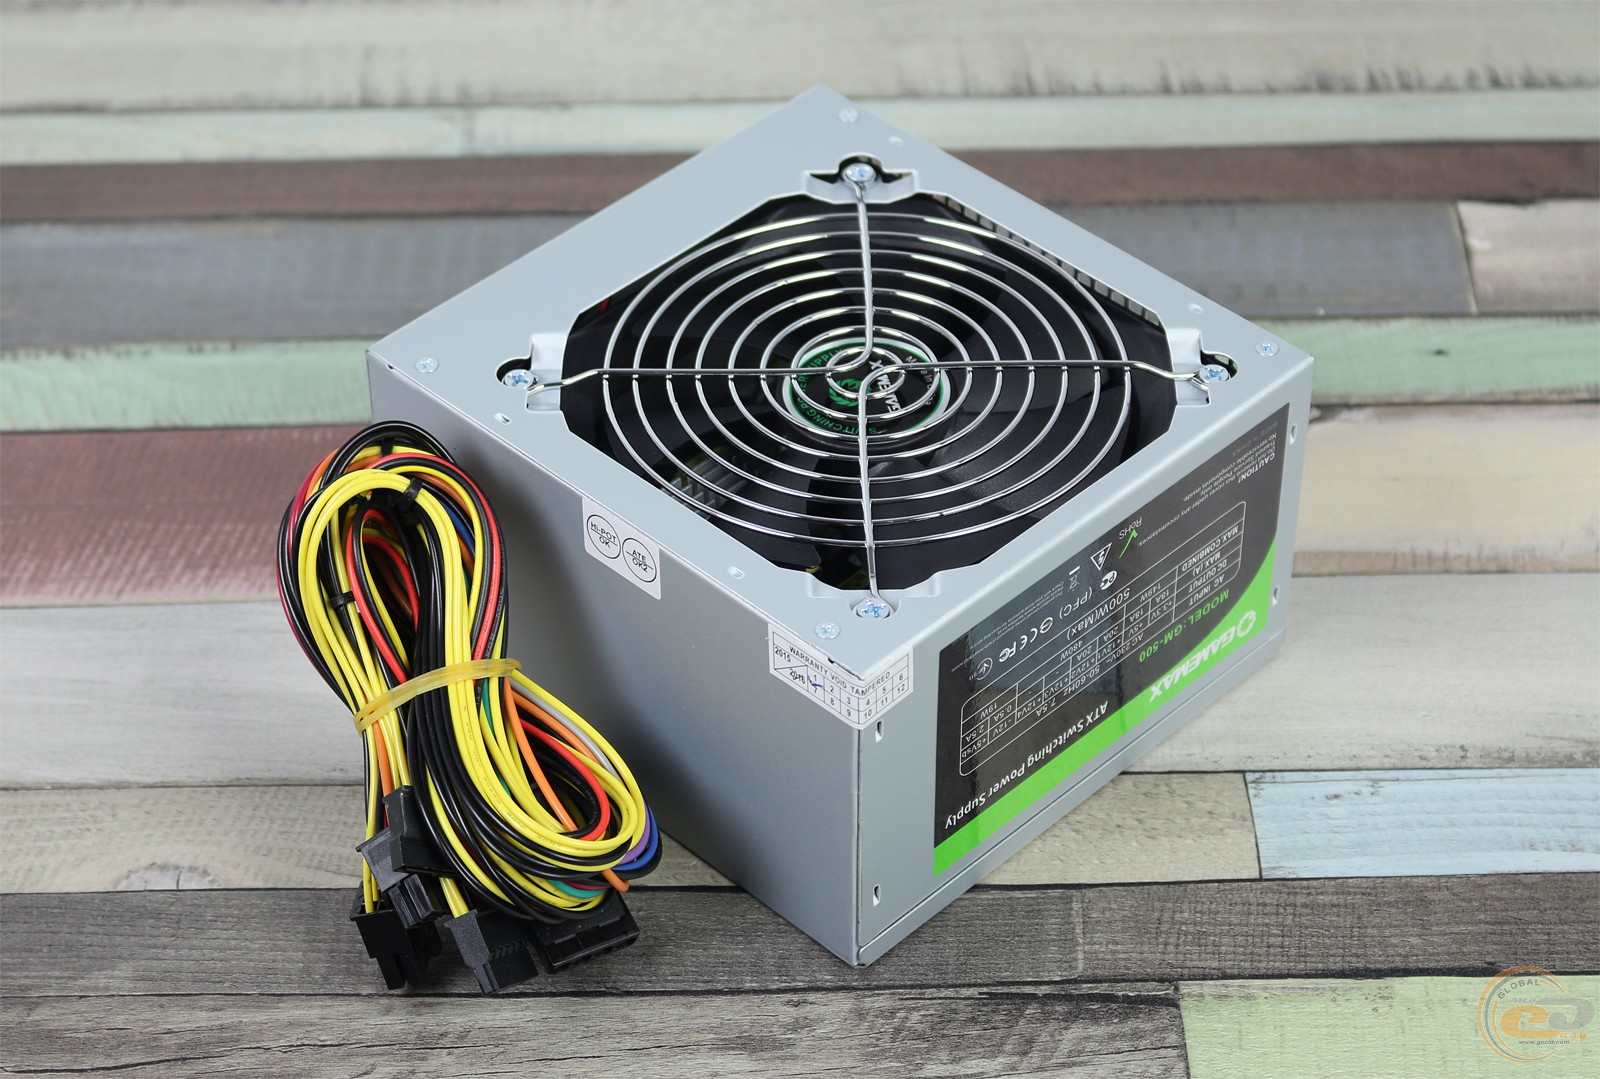 Gamemax Gm 500 1 Gecidcom Power Supply 450watt Psu Gp 450 80 Plus Bronze 14cm Fan